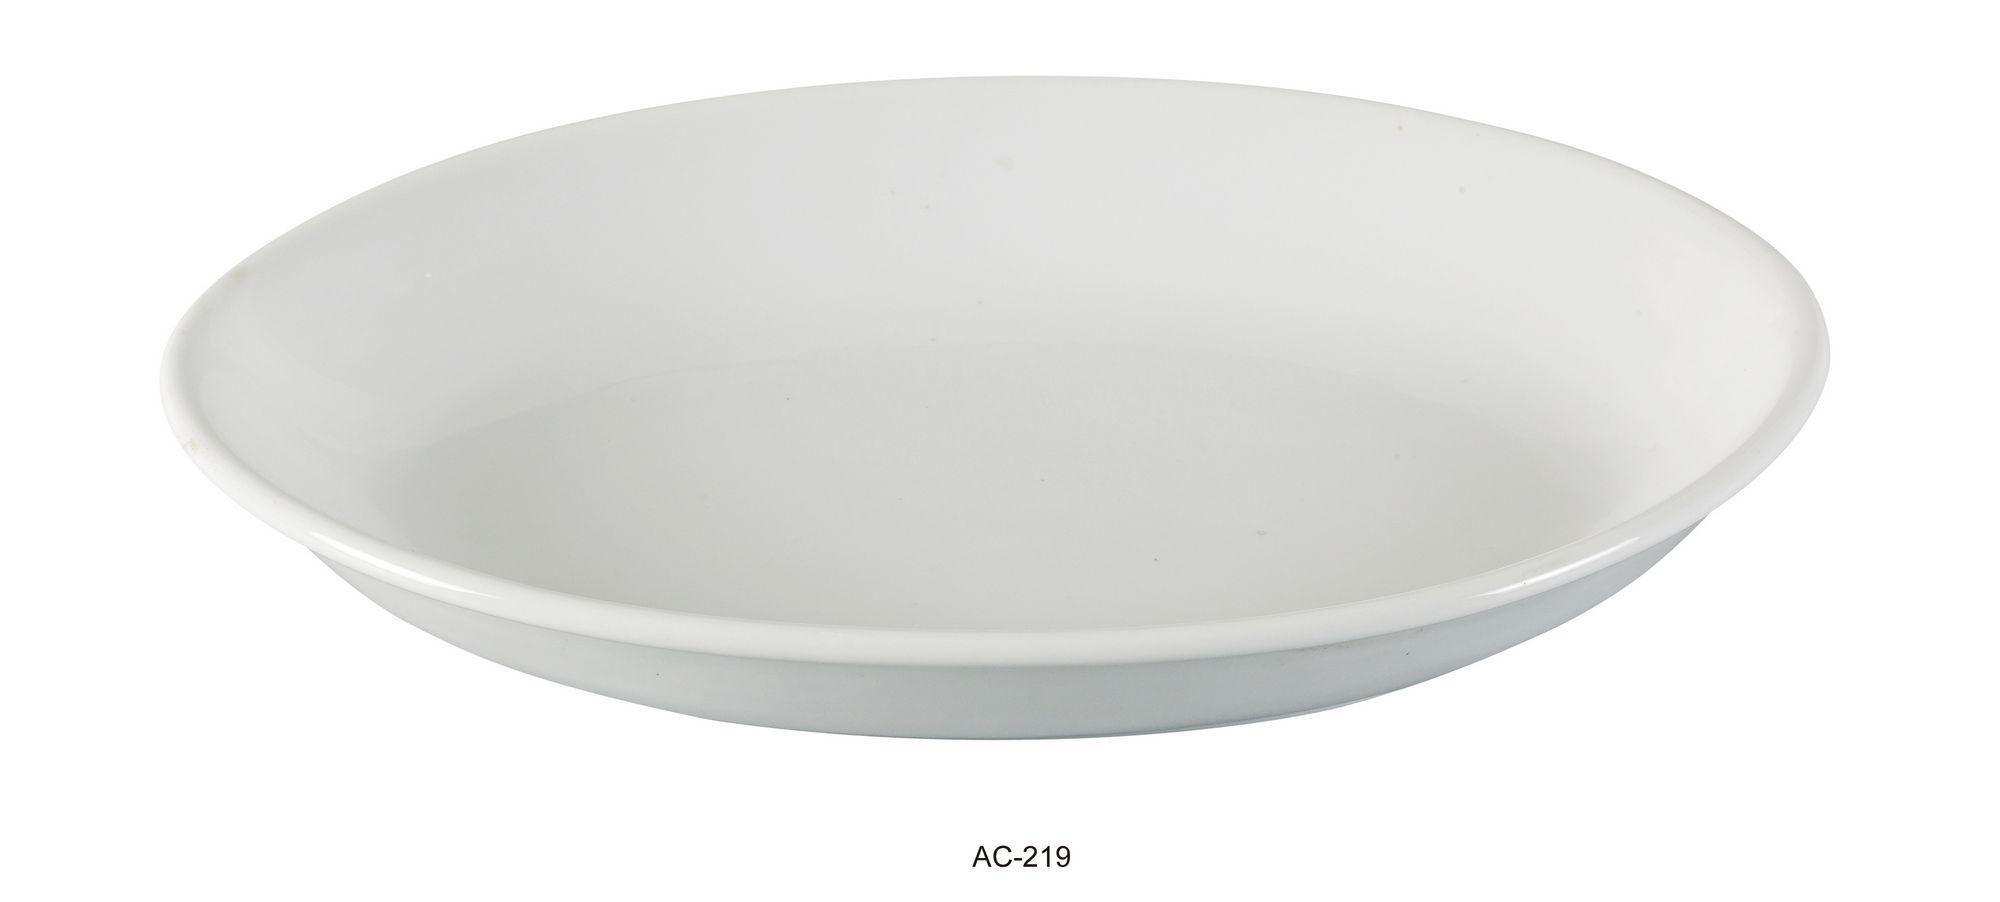 "Yanco AC-219 Abco 19"" x 13 3/4"" x 2 1/4"" Oval Deep Platter"